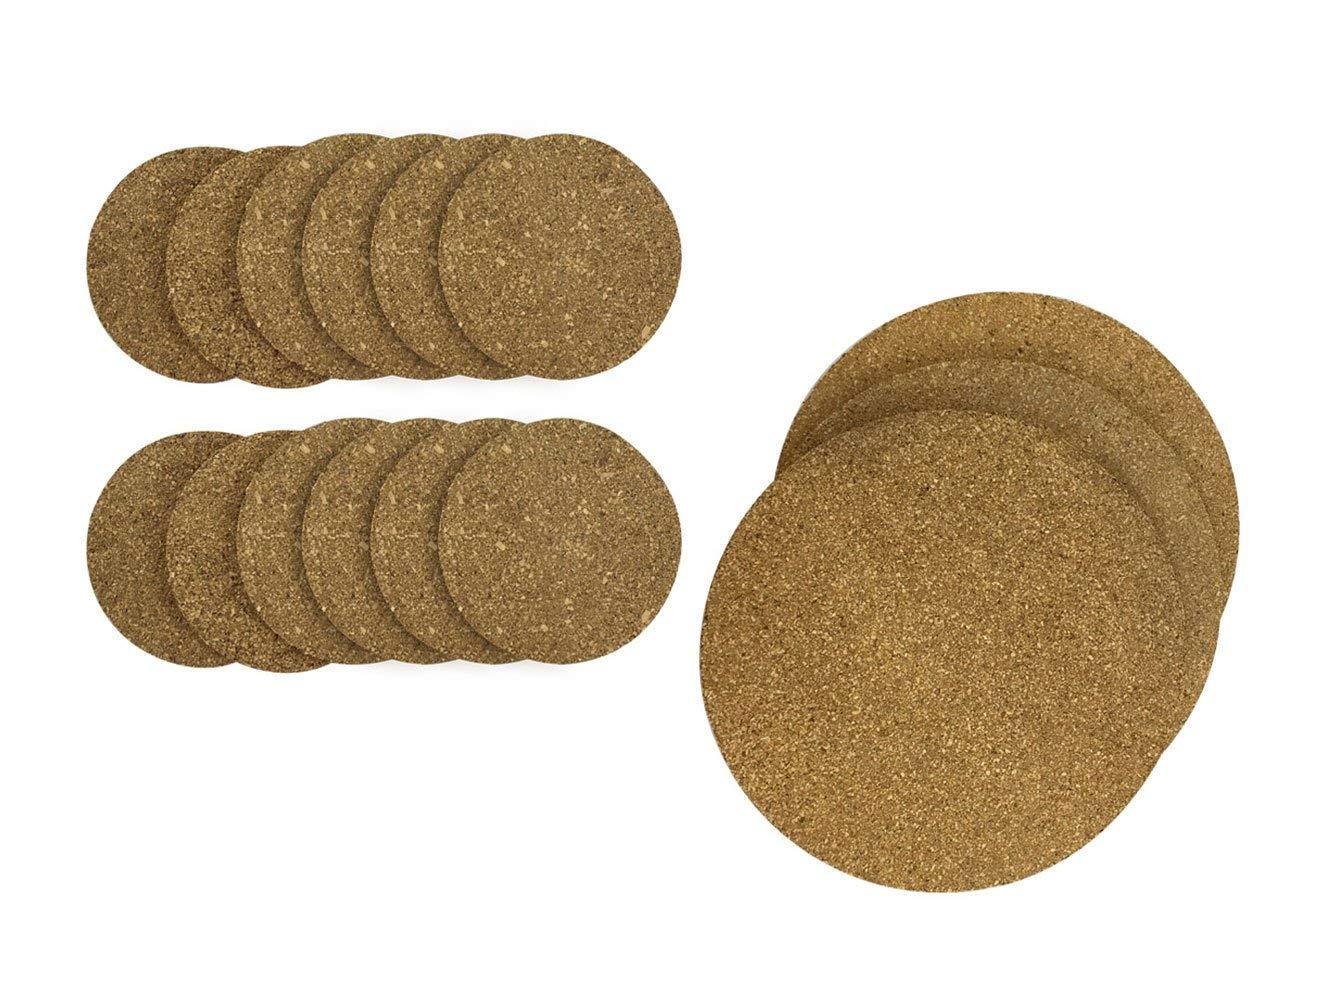 Natural Round 4x4 Cork Coaster Mat Set and 8x8 Cork Trivet Hot Pads Set Bundle, Set of 12 Coasters and 3 Trivets